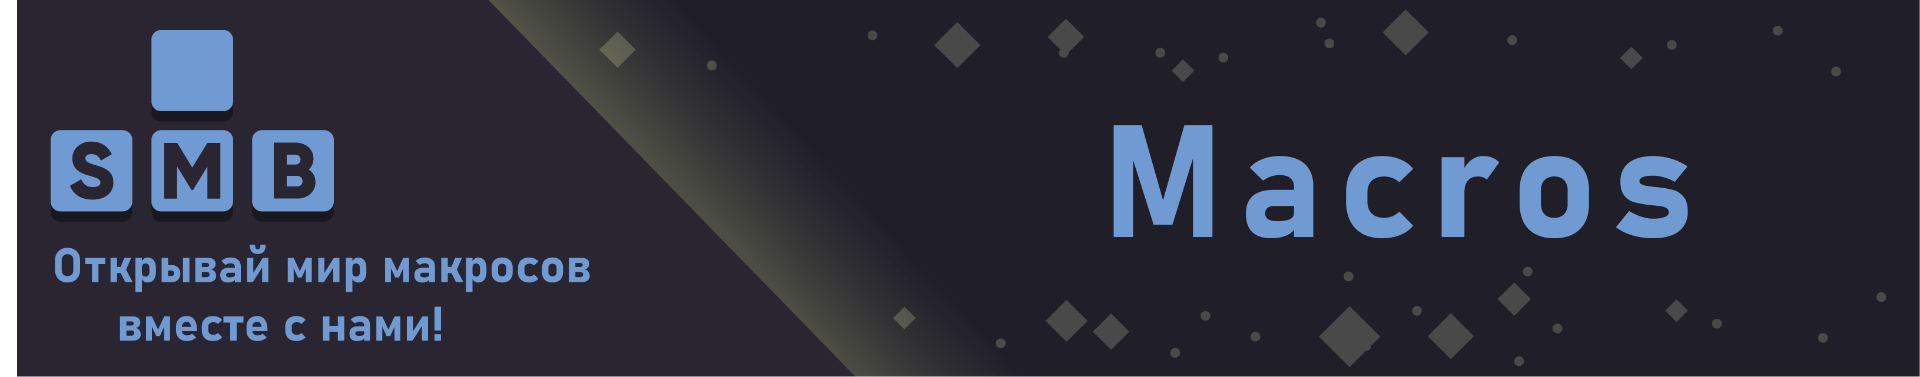 Macros_banner.png.a72a00e17c48a04f1a63ee78d2e5e8be.png